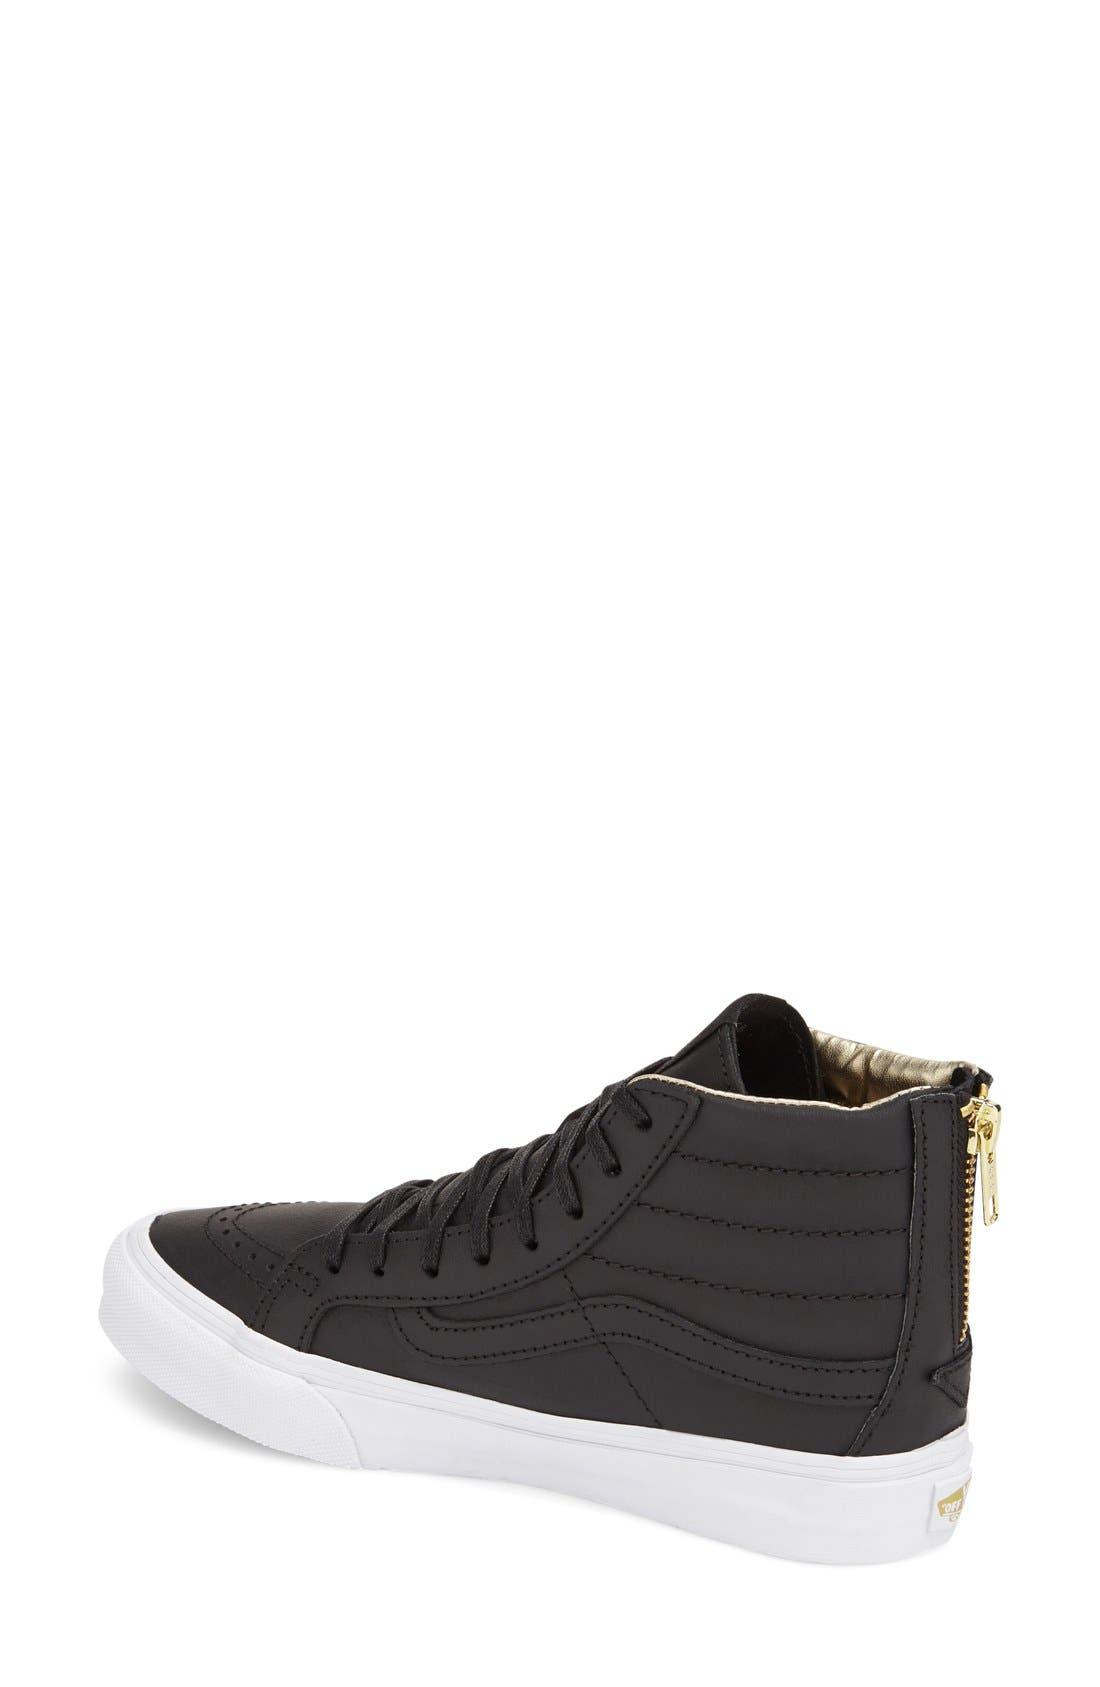 Alternate Image 2  - Vans 'Sk8-Hi Slim' Zip Sneaker (Women)